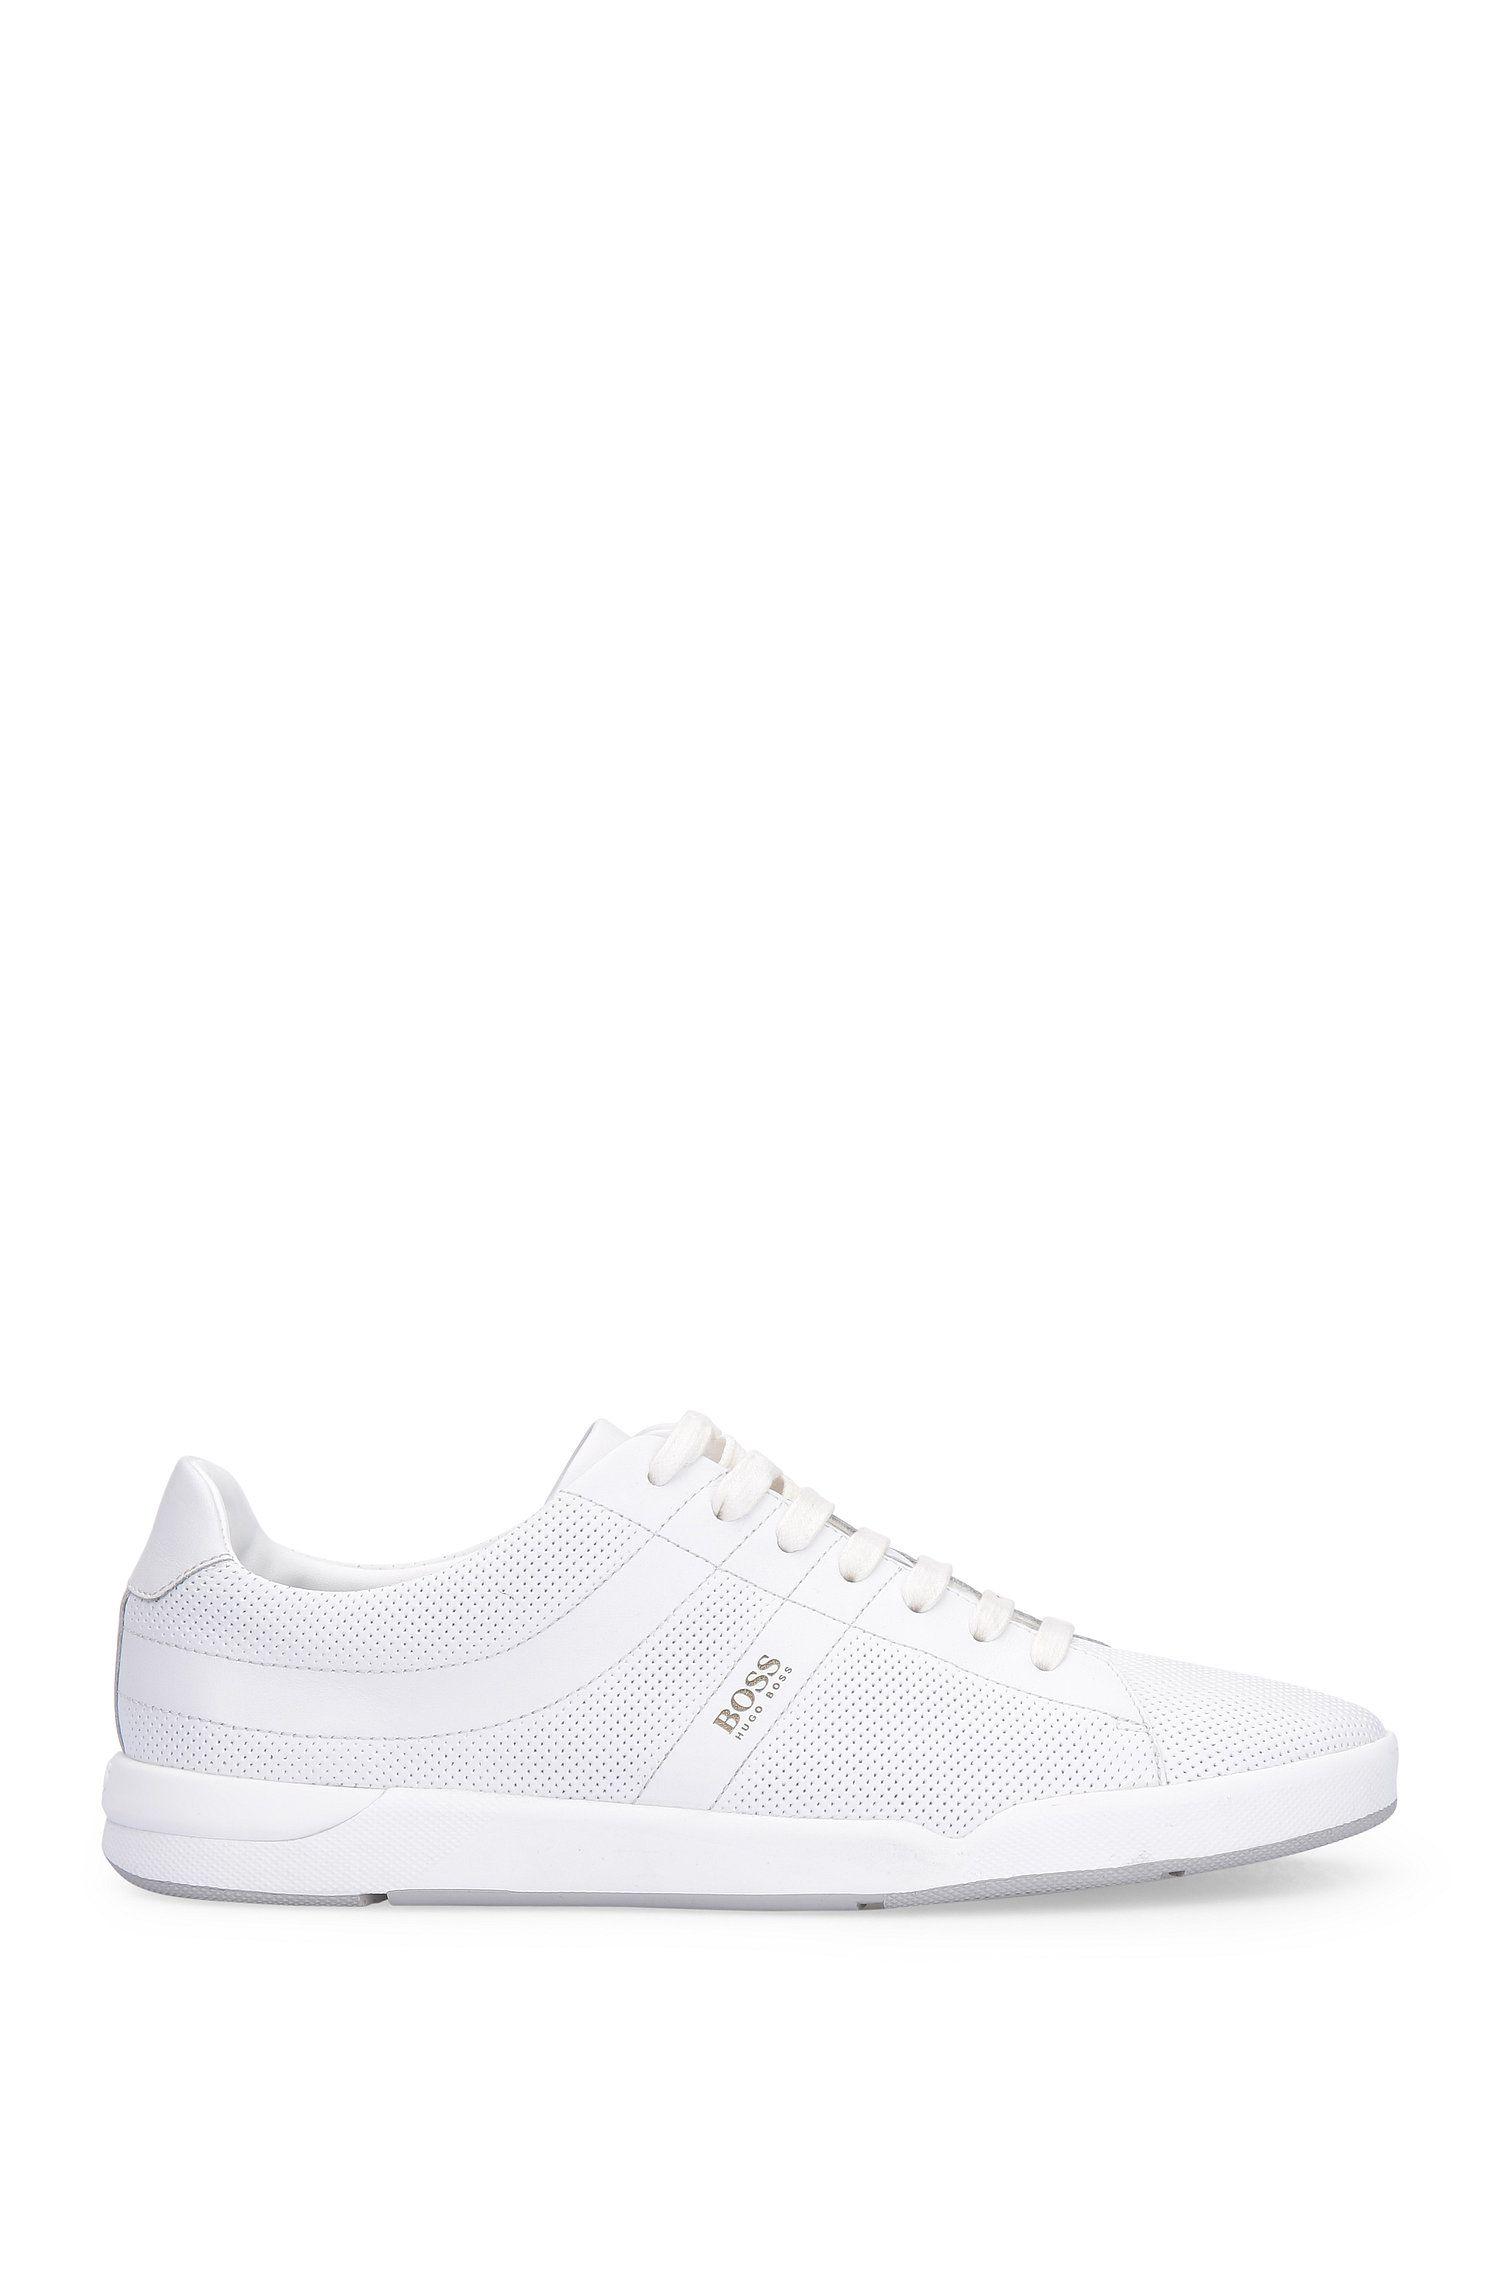 Sneakers aus Leder mit Lochmuster: ´Stillnes_Tenn_ltpf`